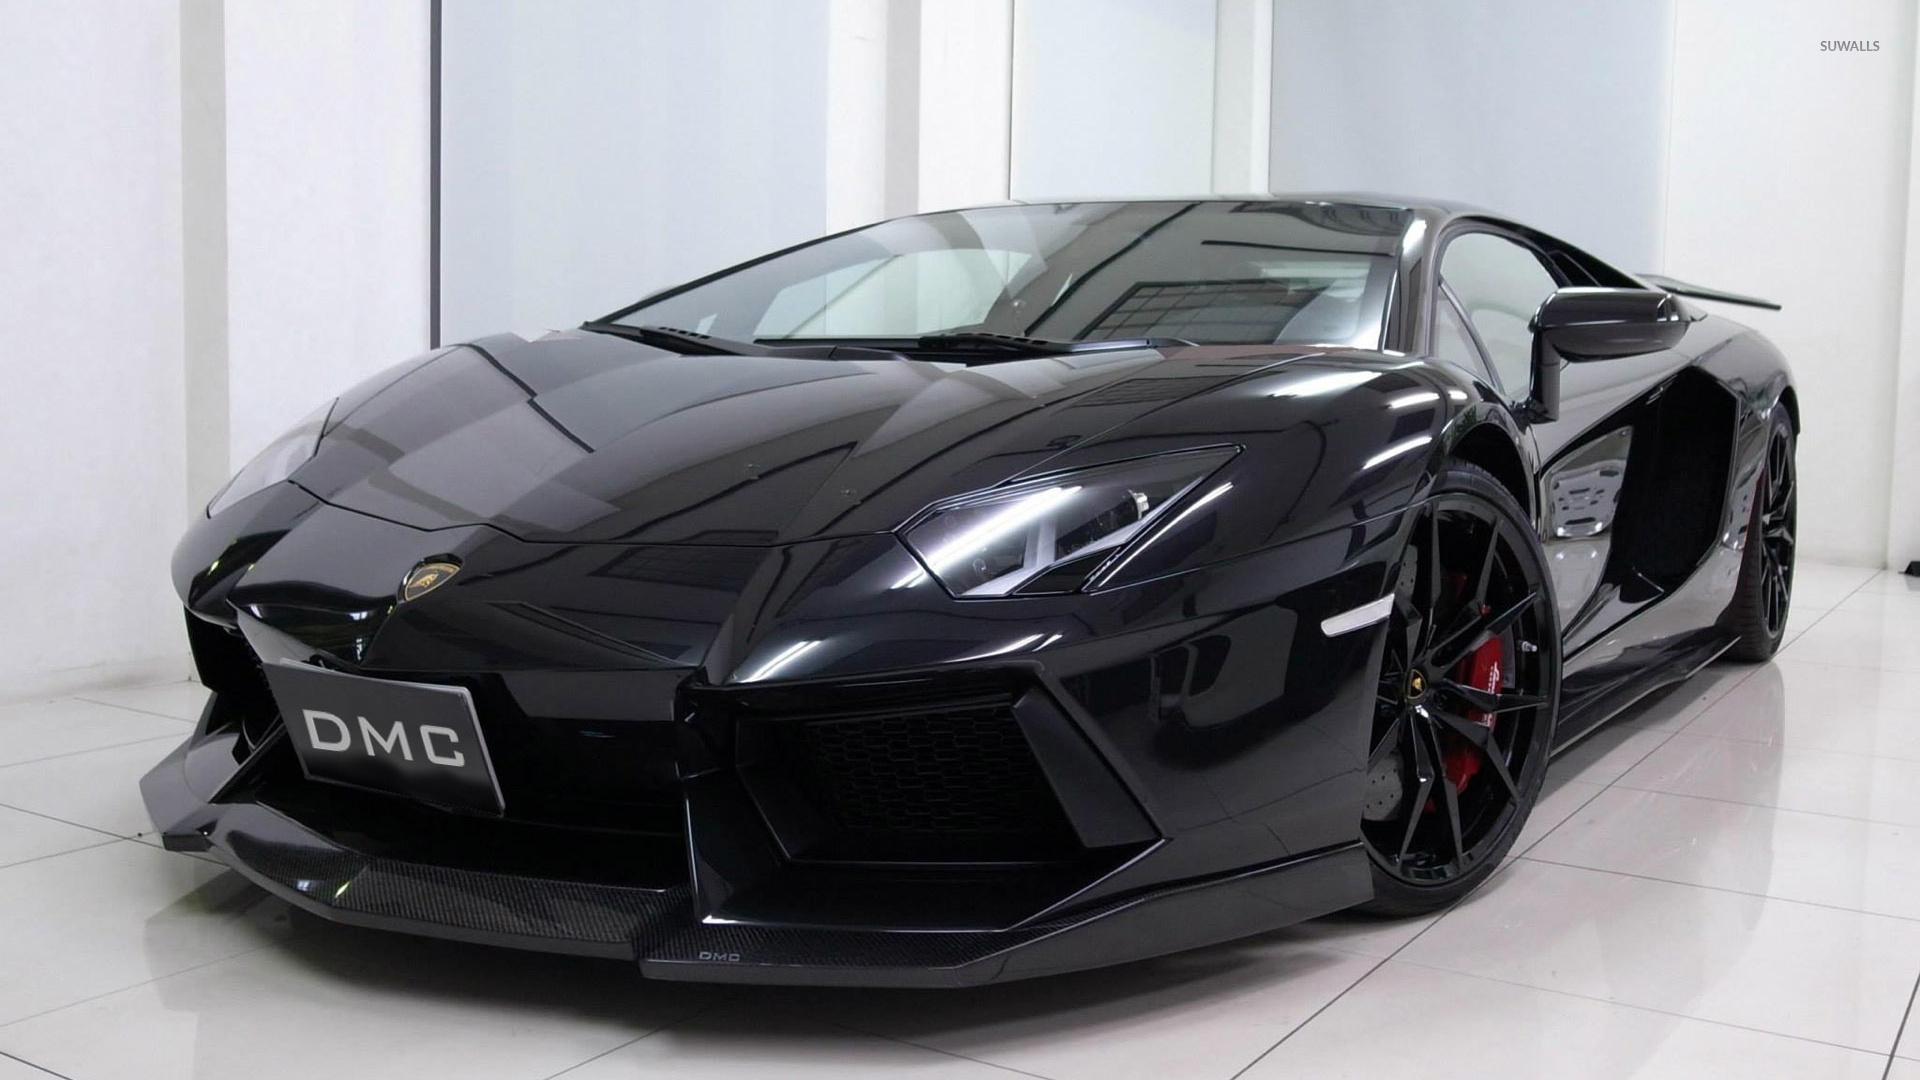 lamborghini aventador 16 wallpaper - Lamborghini Aventador 2015 Black